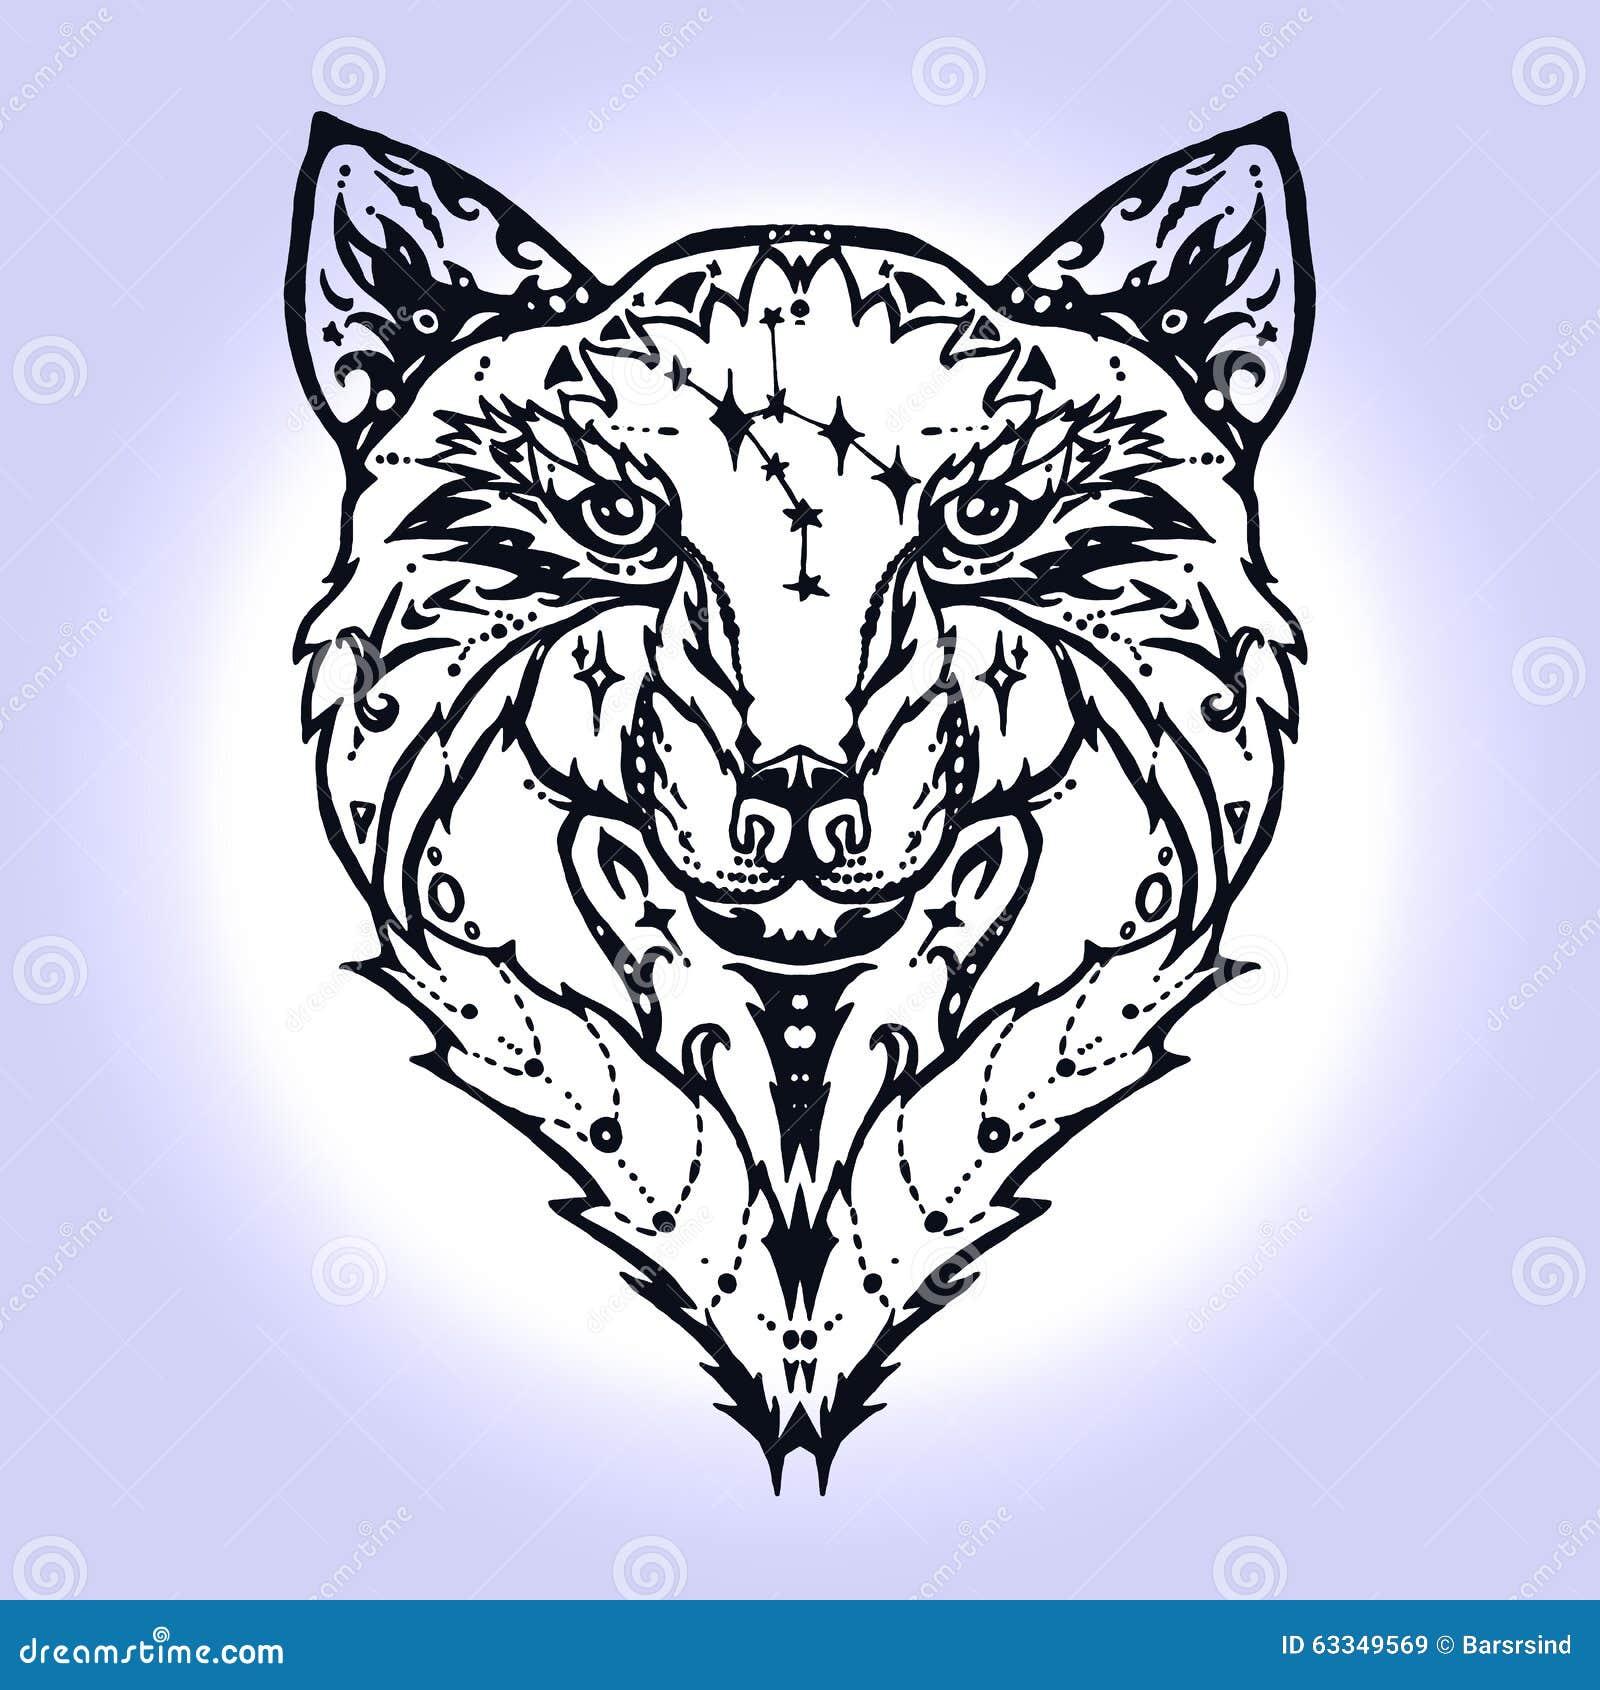 Line Art Wolf Tattoo: Wild Wolf Tattoo Stock Illustration. Illustration Of Boho